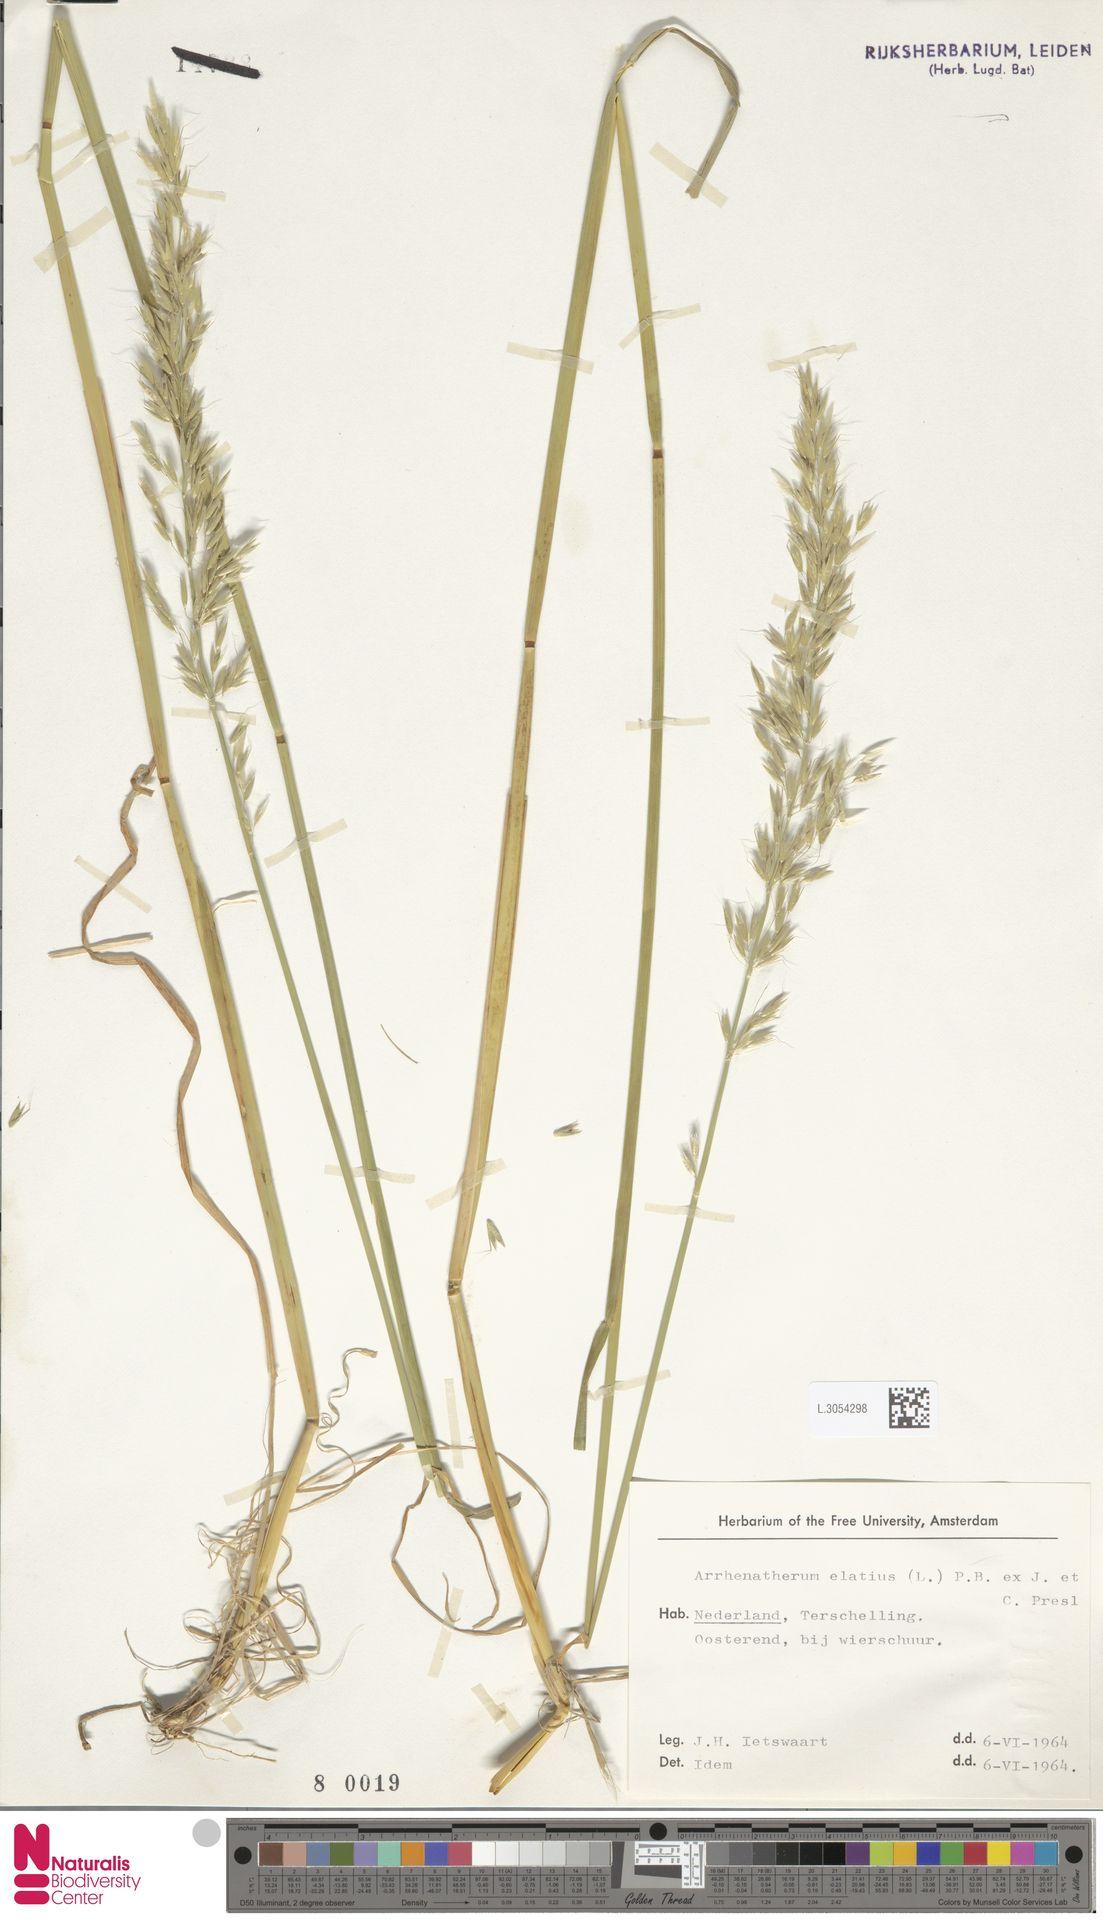 L.3054298   Arrhenatherum elatius (L.) P.Beauv. ex J.Presl & C.Presl